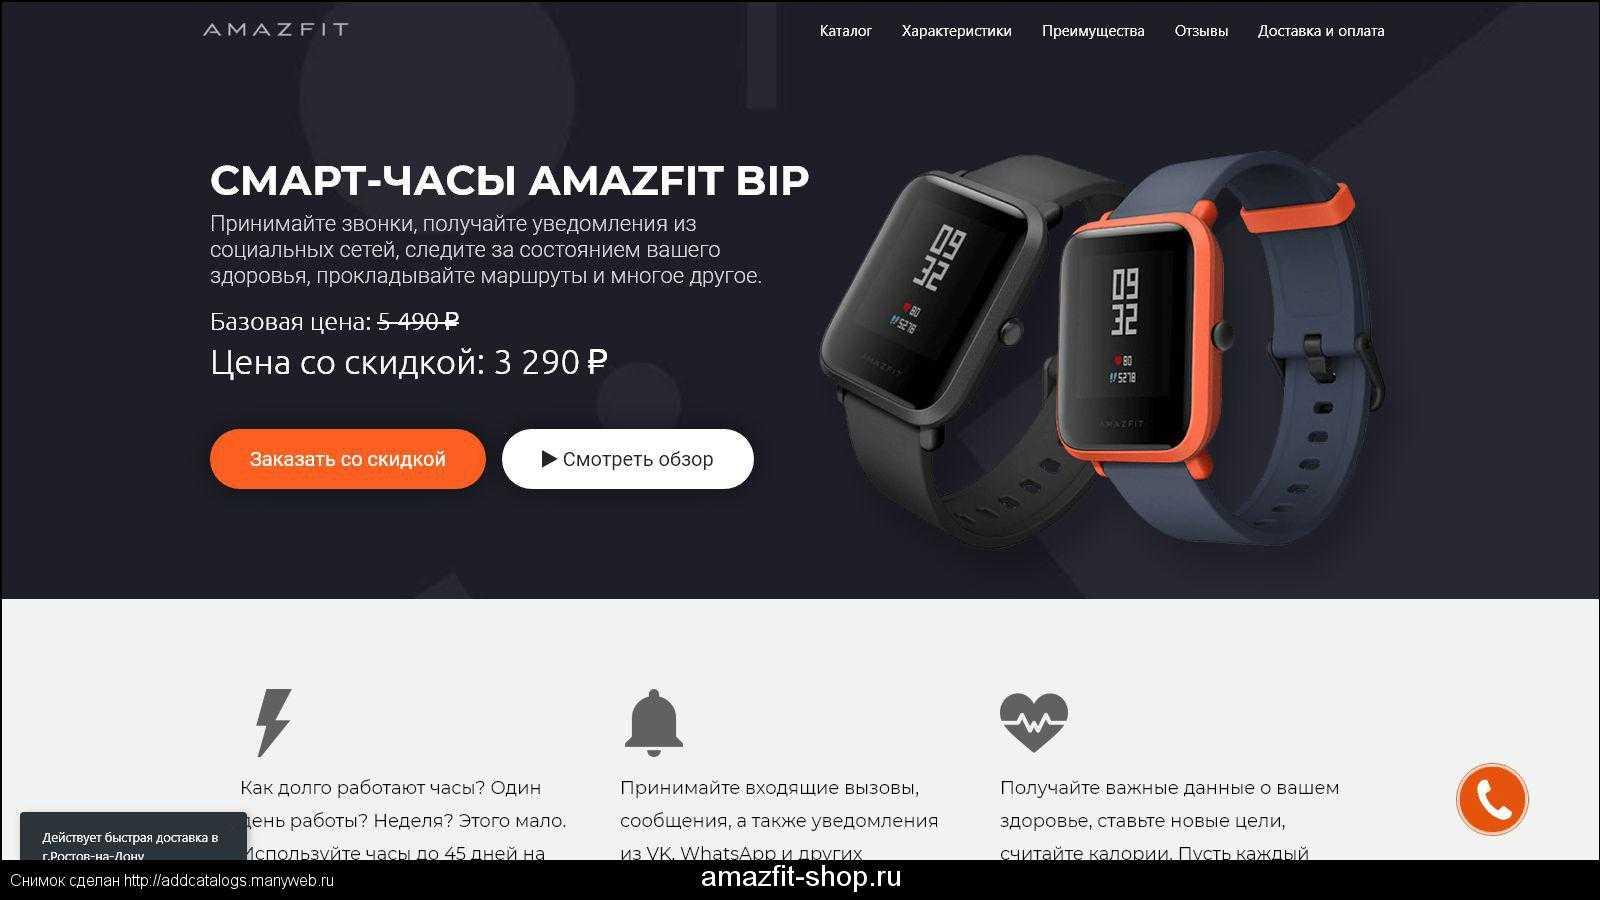 Сравнение amazfit health watch и amazfit bip. это не amazfit bip 2